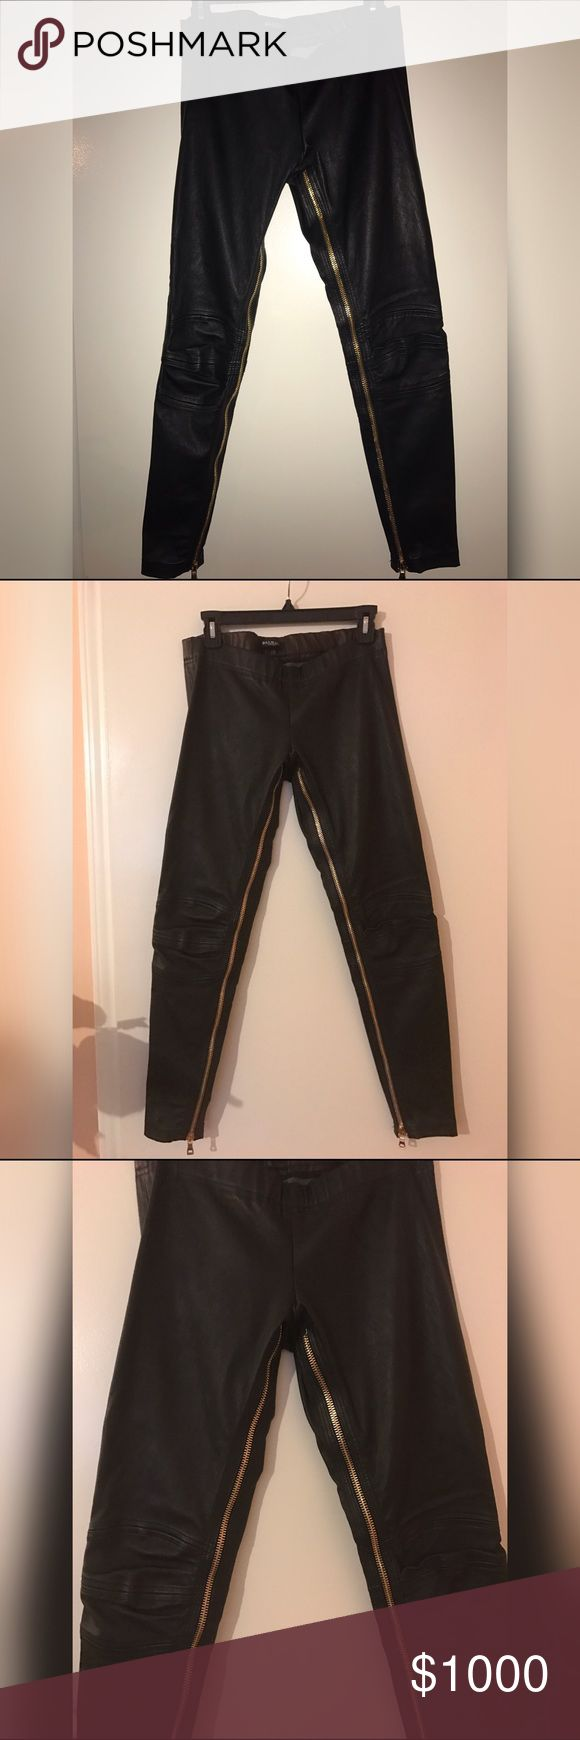 BALMAIN Zipper Leggings Fr 38 (S) The leather leggings feature gold metal zippers running on the inside of both legs. Size Fr 38  Small Balmain Pants Leggings